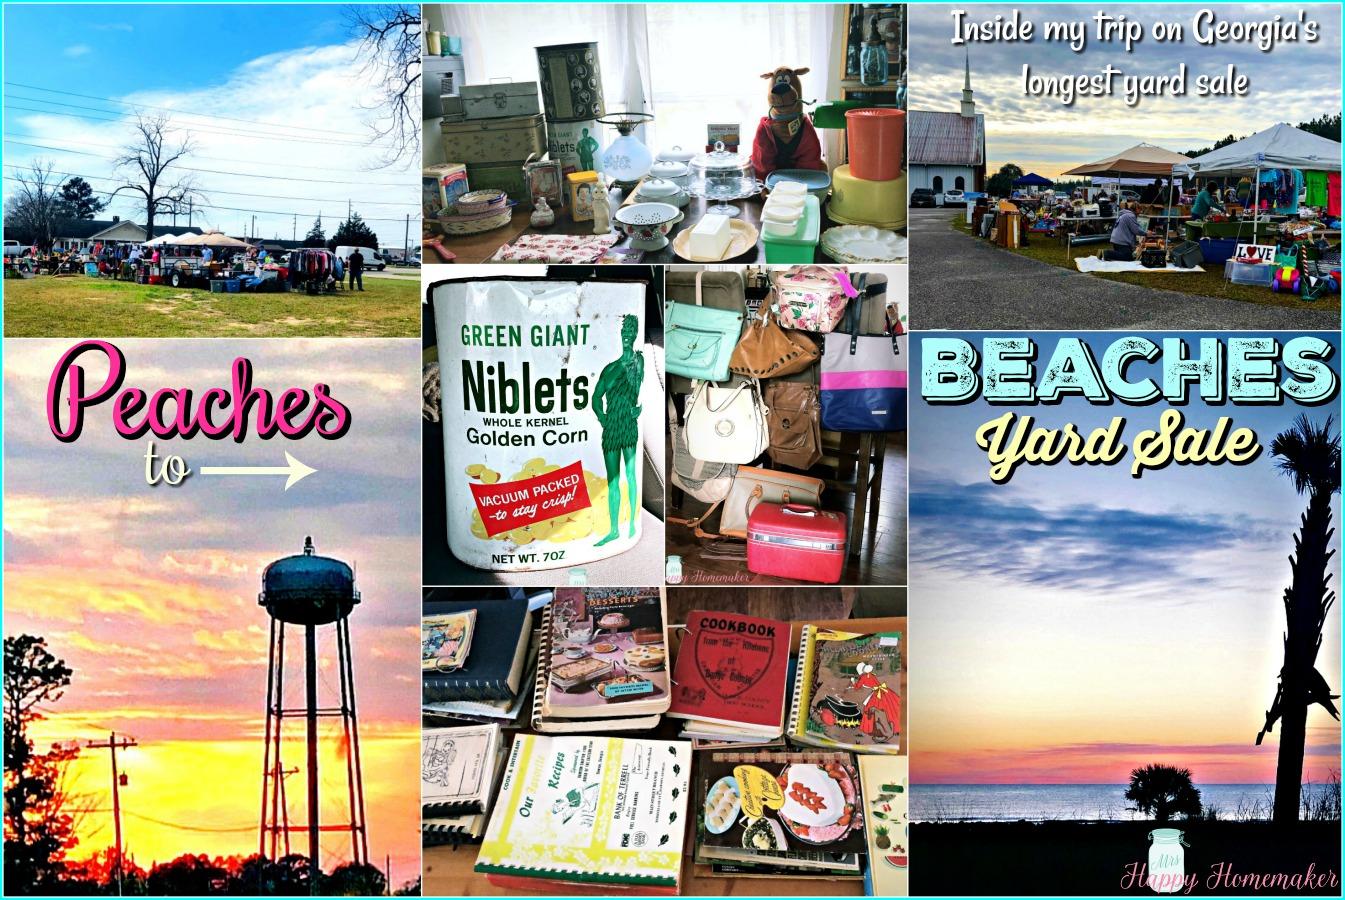 Georgia's Longest Yard Sale - Peaches to Beaches collage